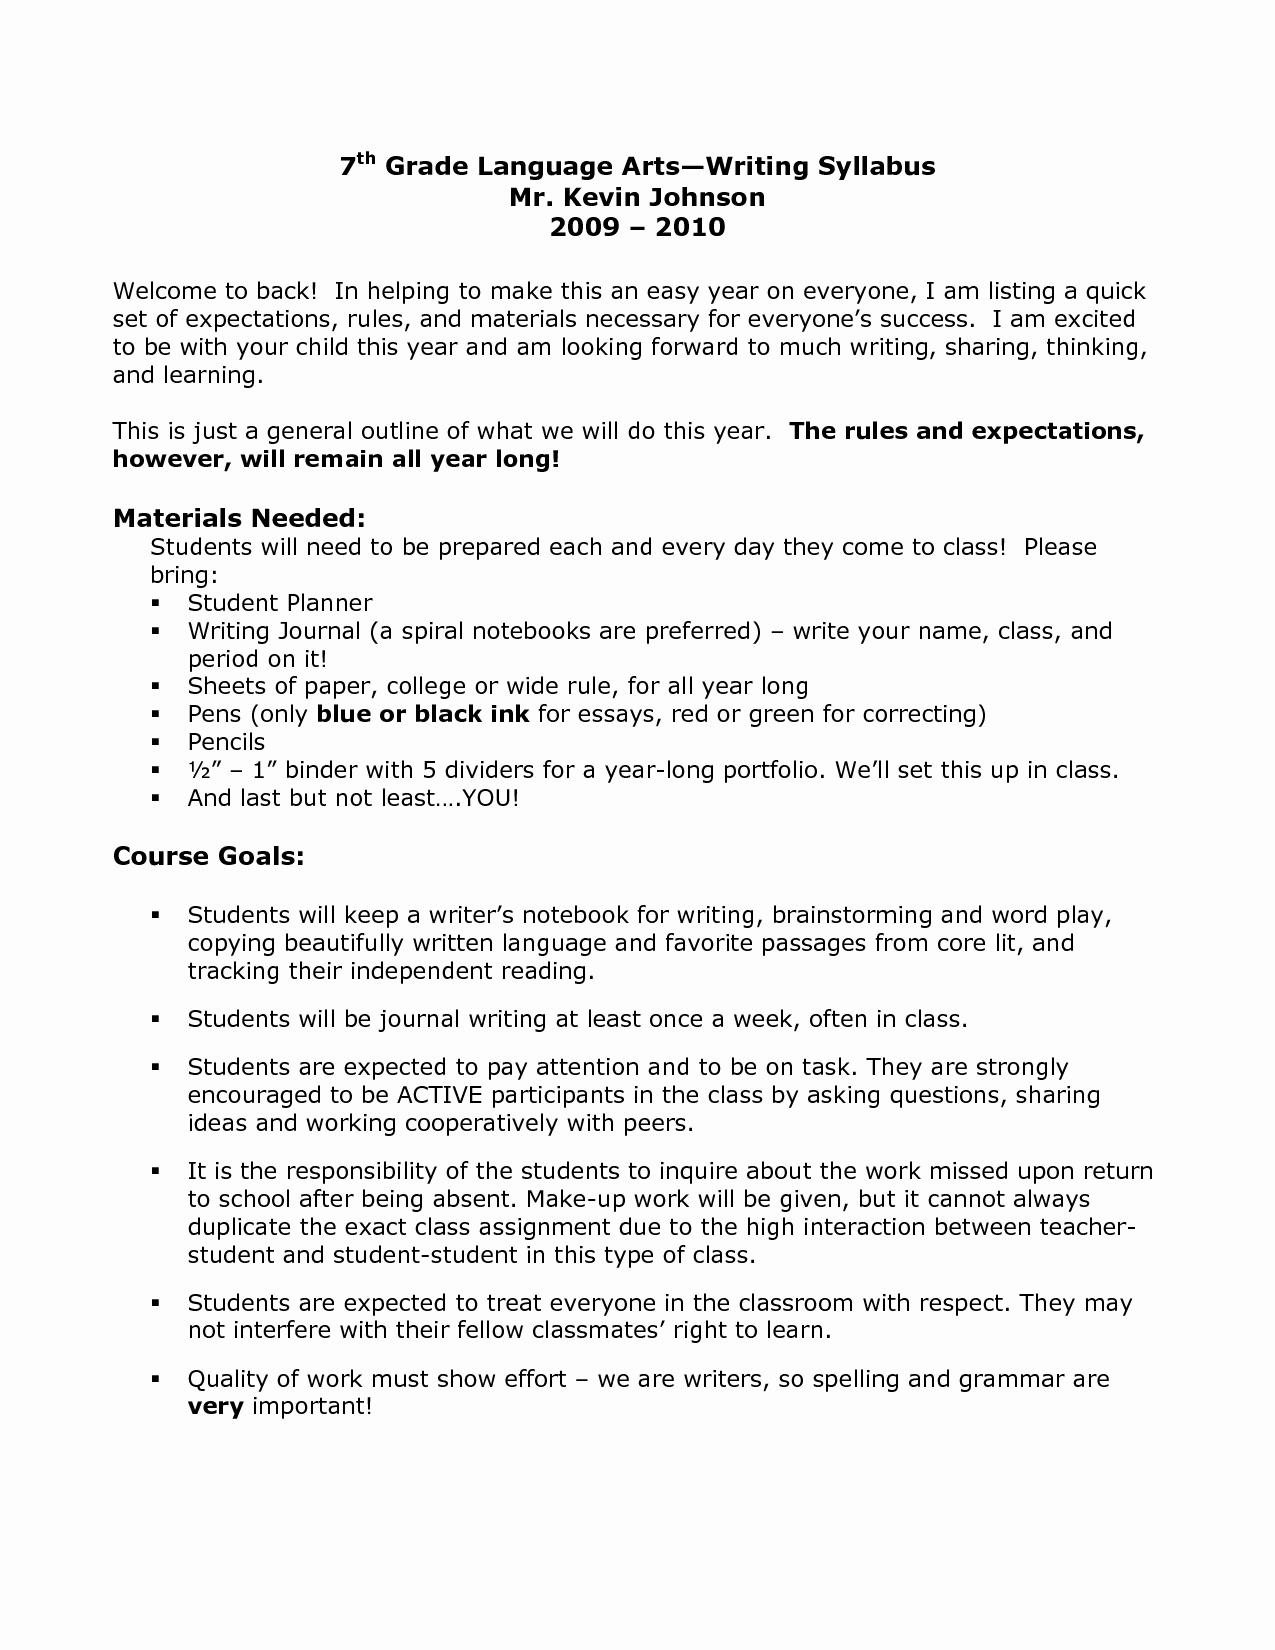 7th Grade Language Arts Worksheets Fresh 7th Grade Mon Core Language Arts Worksheets Diy Worksheet